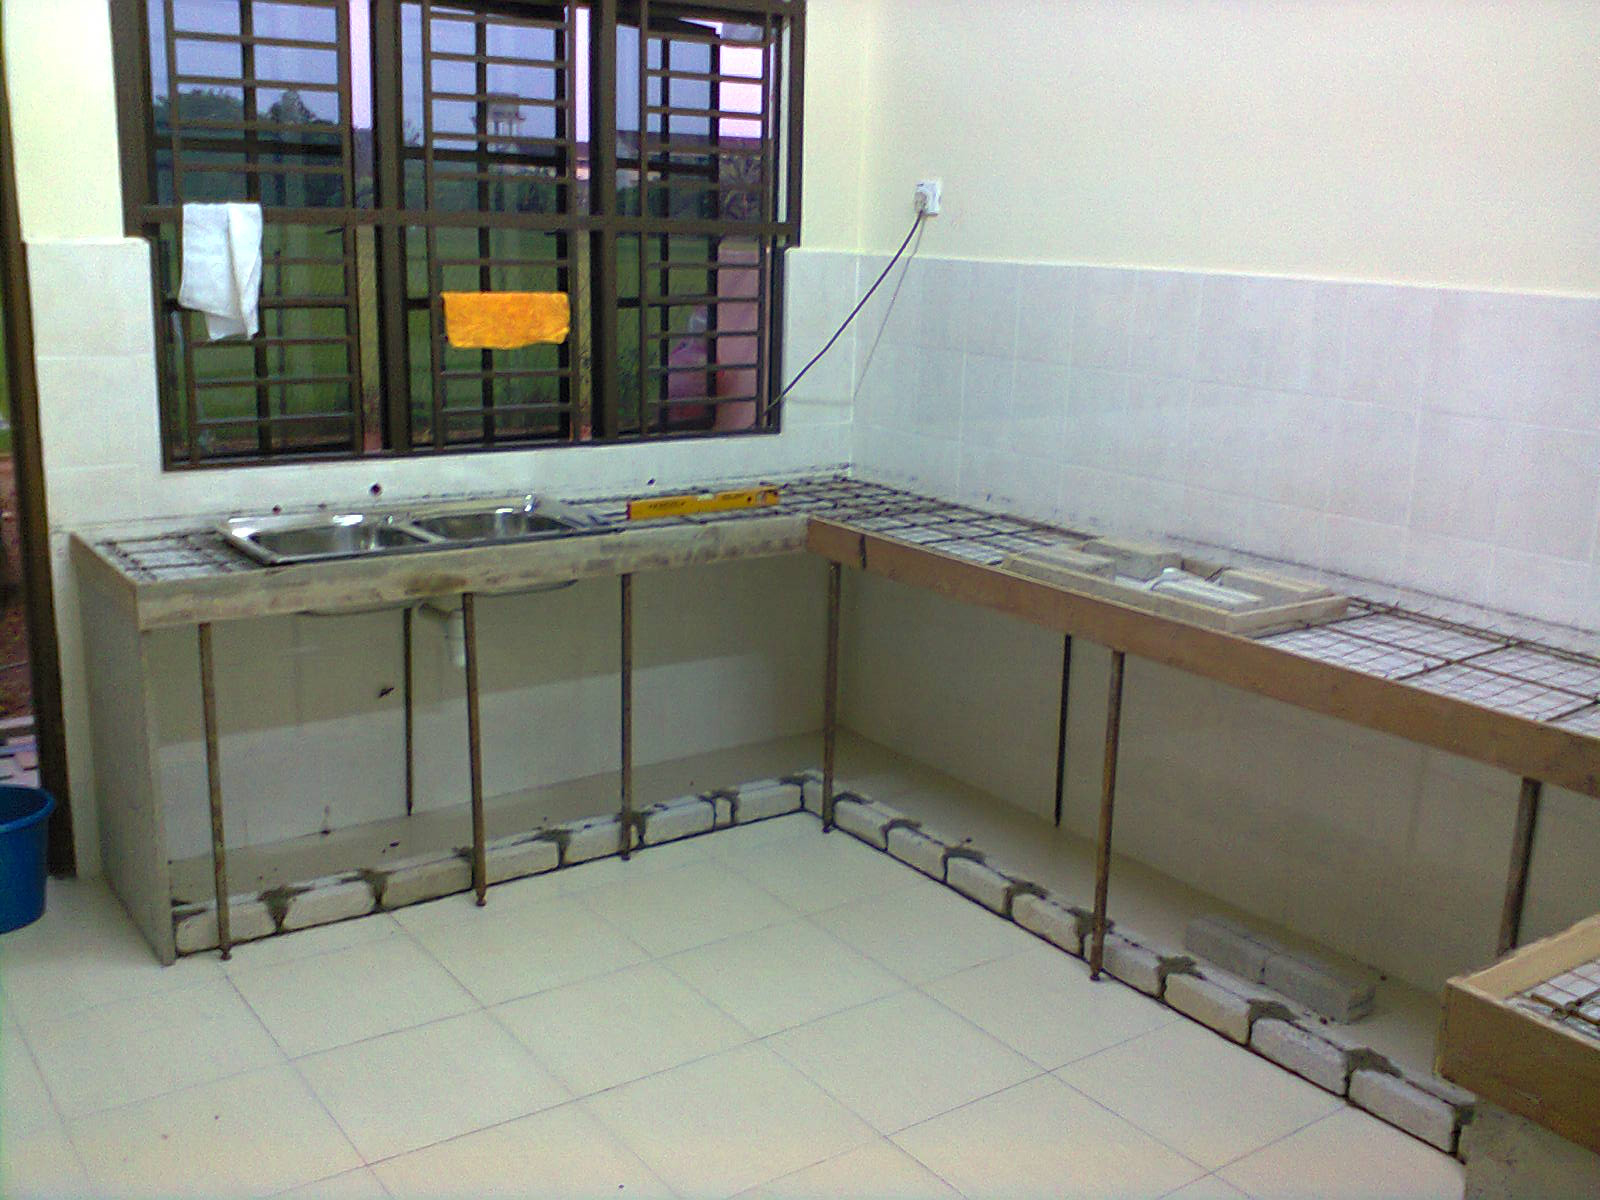 Ini Projek Kabinet Dapur Kami Pada Bulan Jun 2017 Yang Lalu Tuan Rumah Dr Yin Memilih Untuk Membuat Jenis Top Konkret Dan Panel Melamine